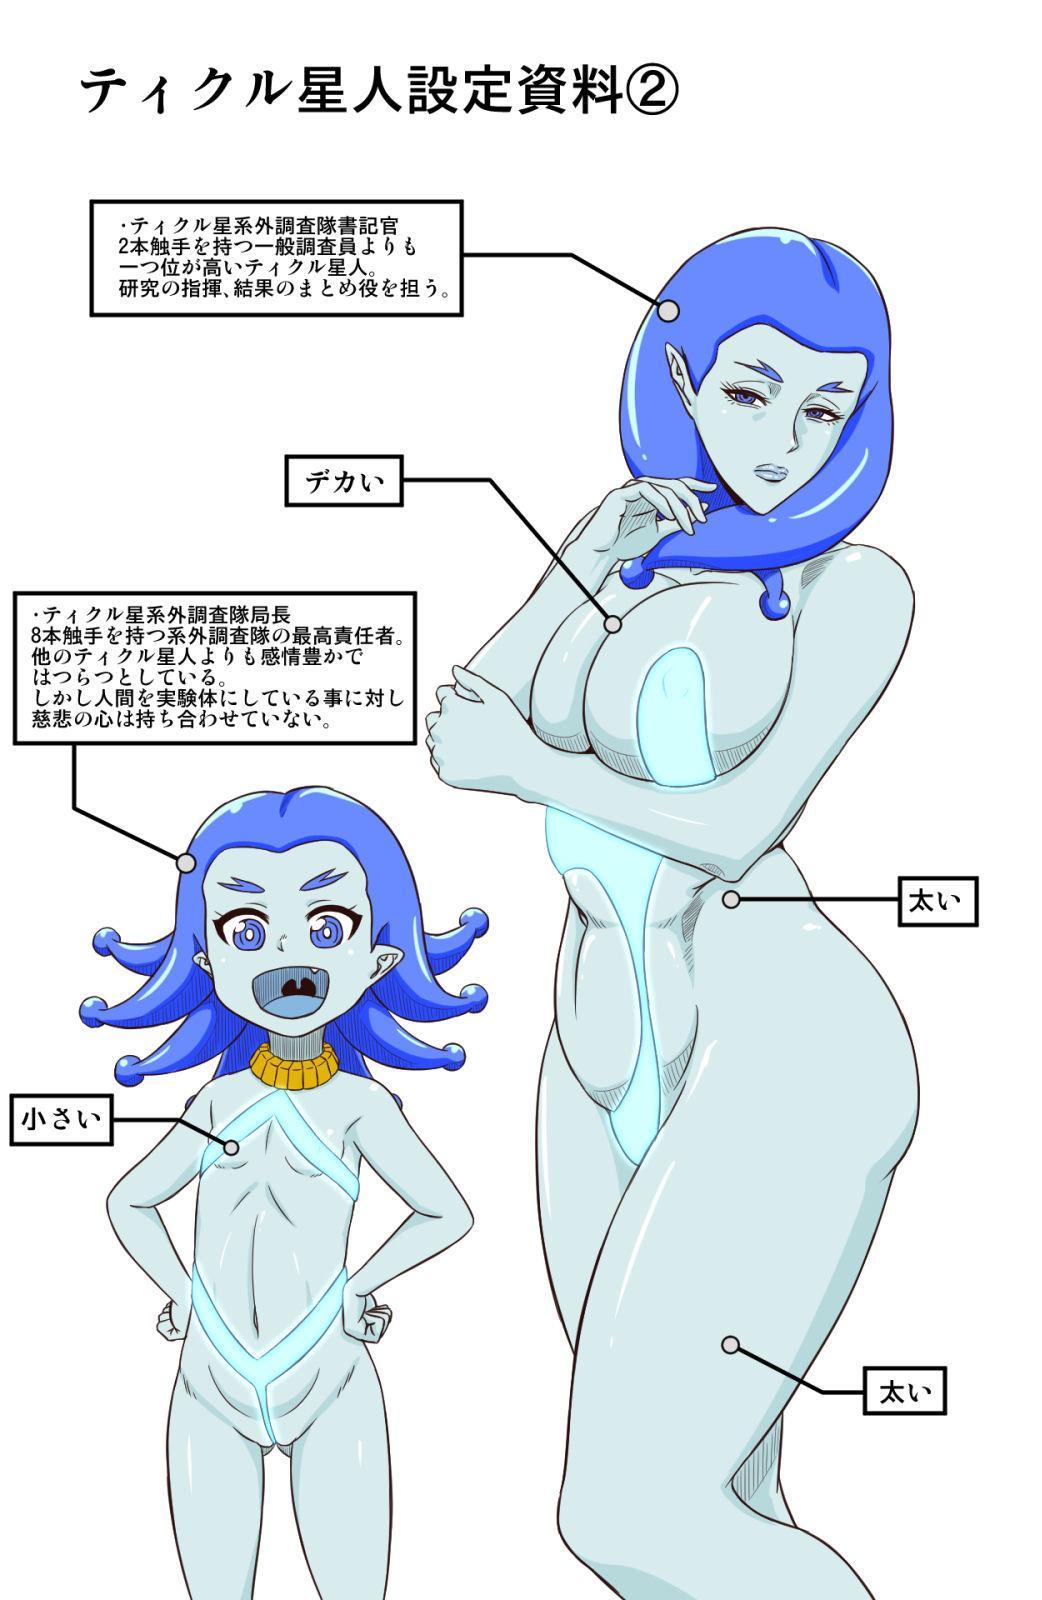 Tickle Seijin ni Yoru Kusuguri Energy Kenkyuu Report 18